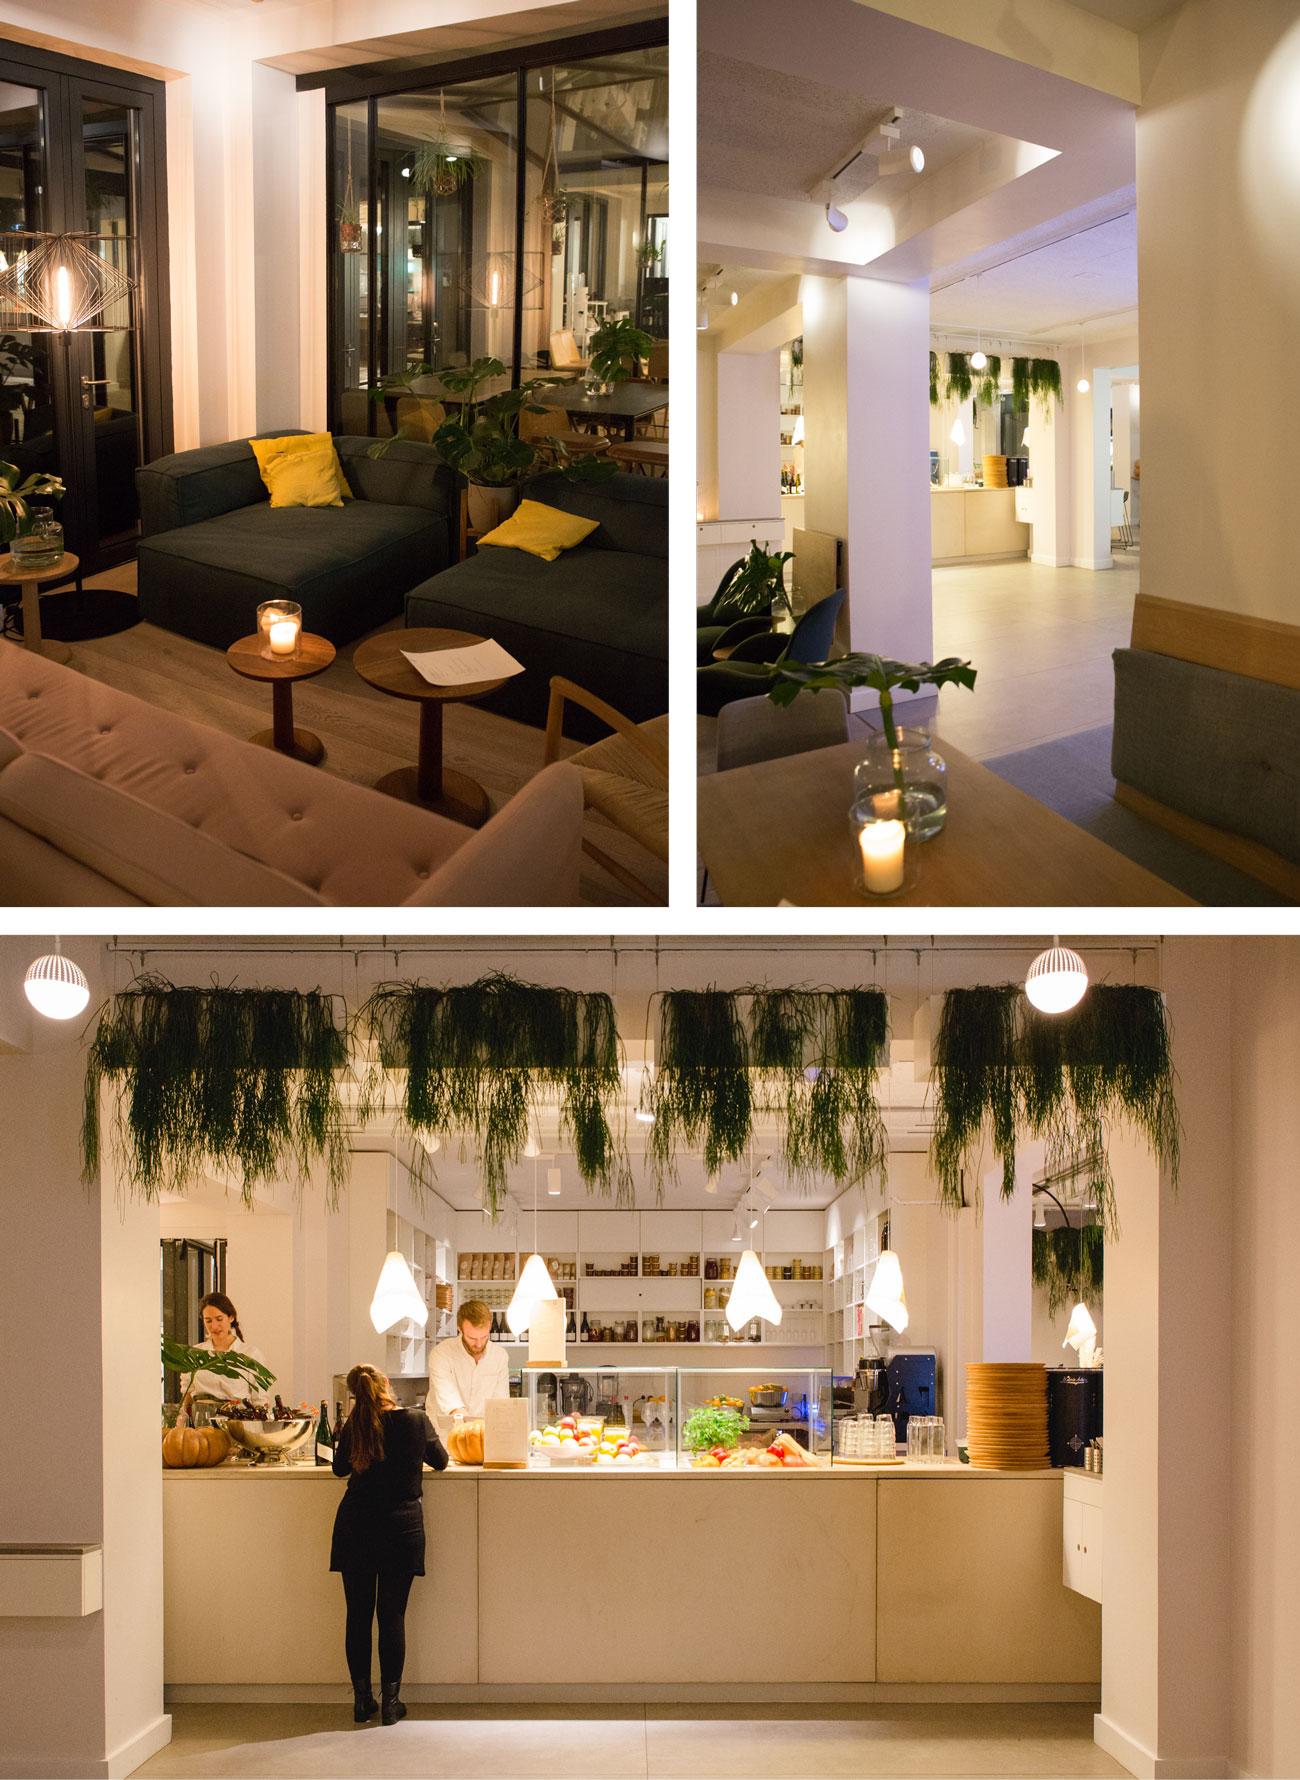 held am herd blogst17 7 heldamherd. Black Bedroom Furniture Sets. Home Design Ideas